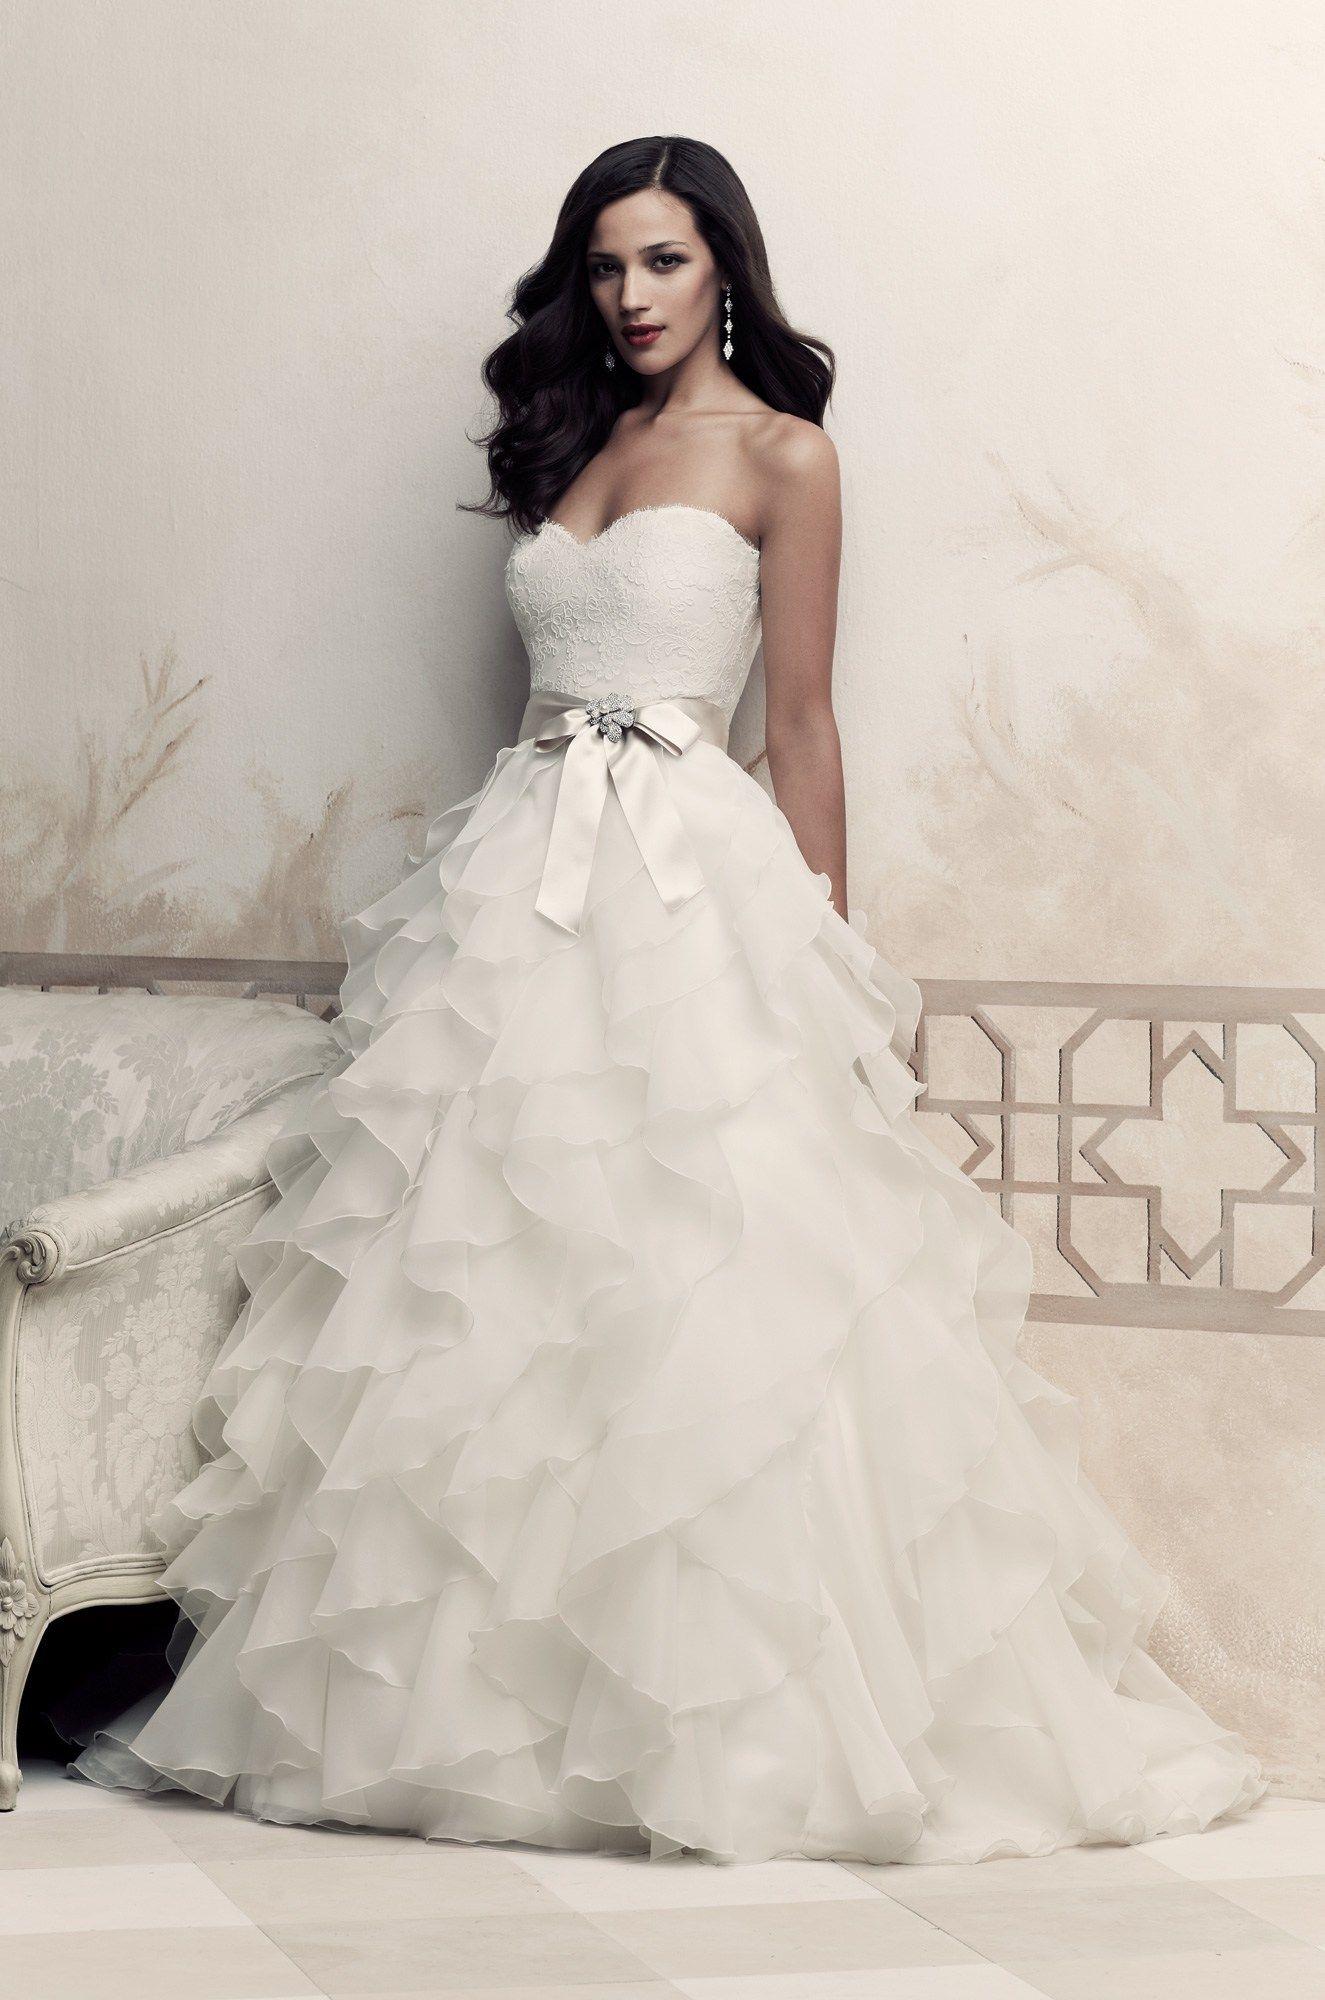 Romantic ruffled wedding dress style paloma blanca lace